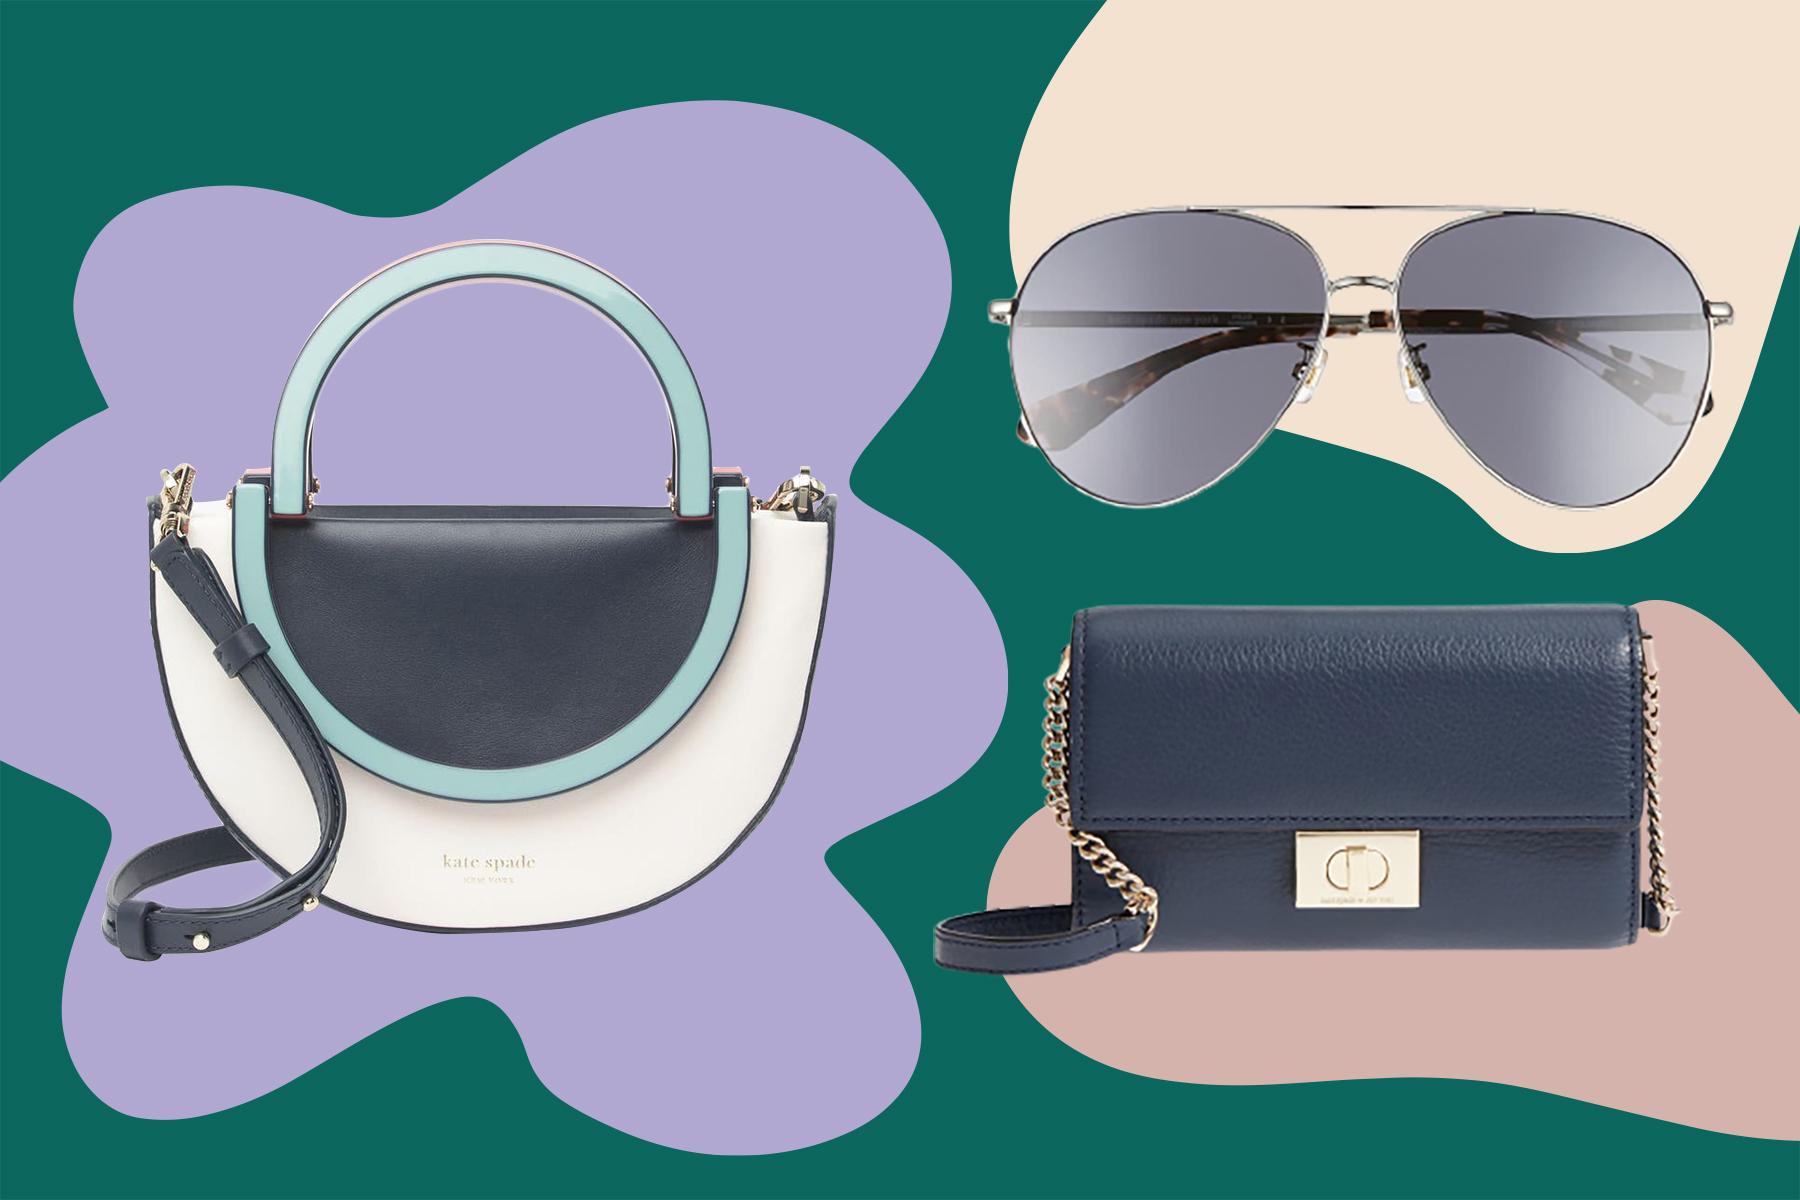 kate spade new york handbags and